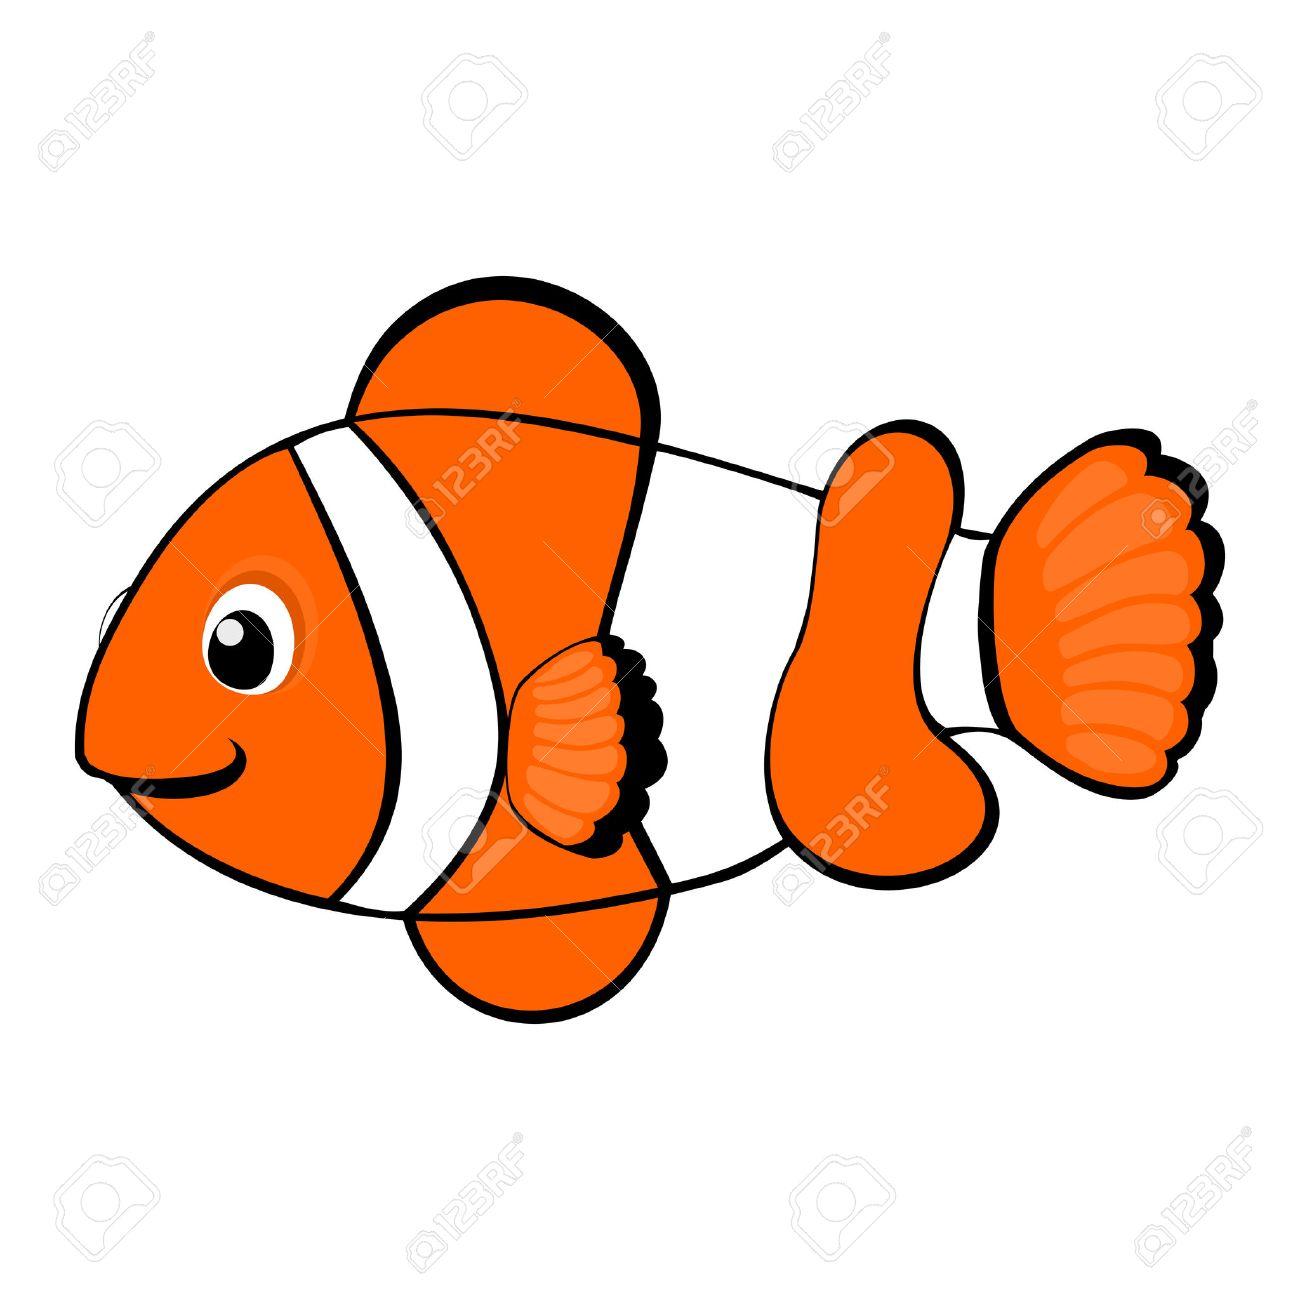 Картинки по запросу fish cartoon